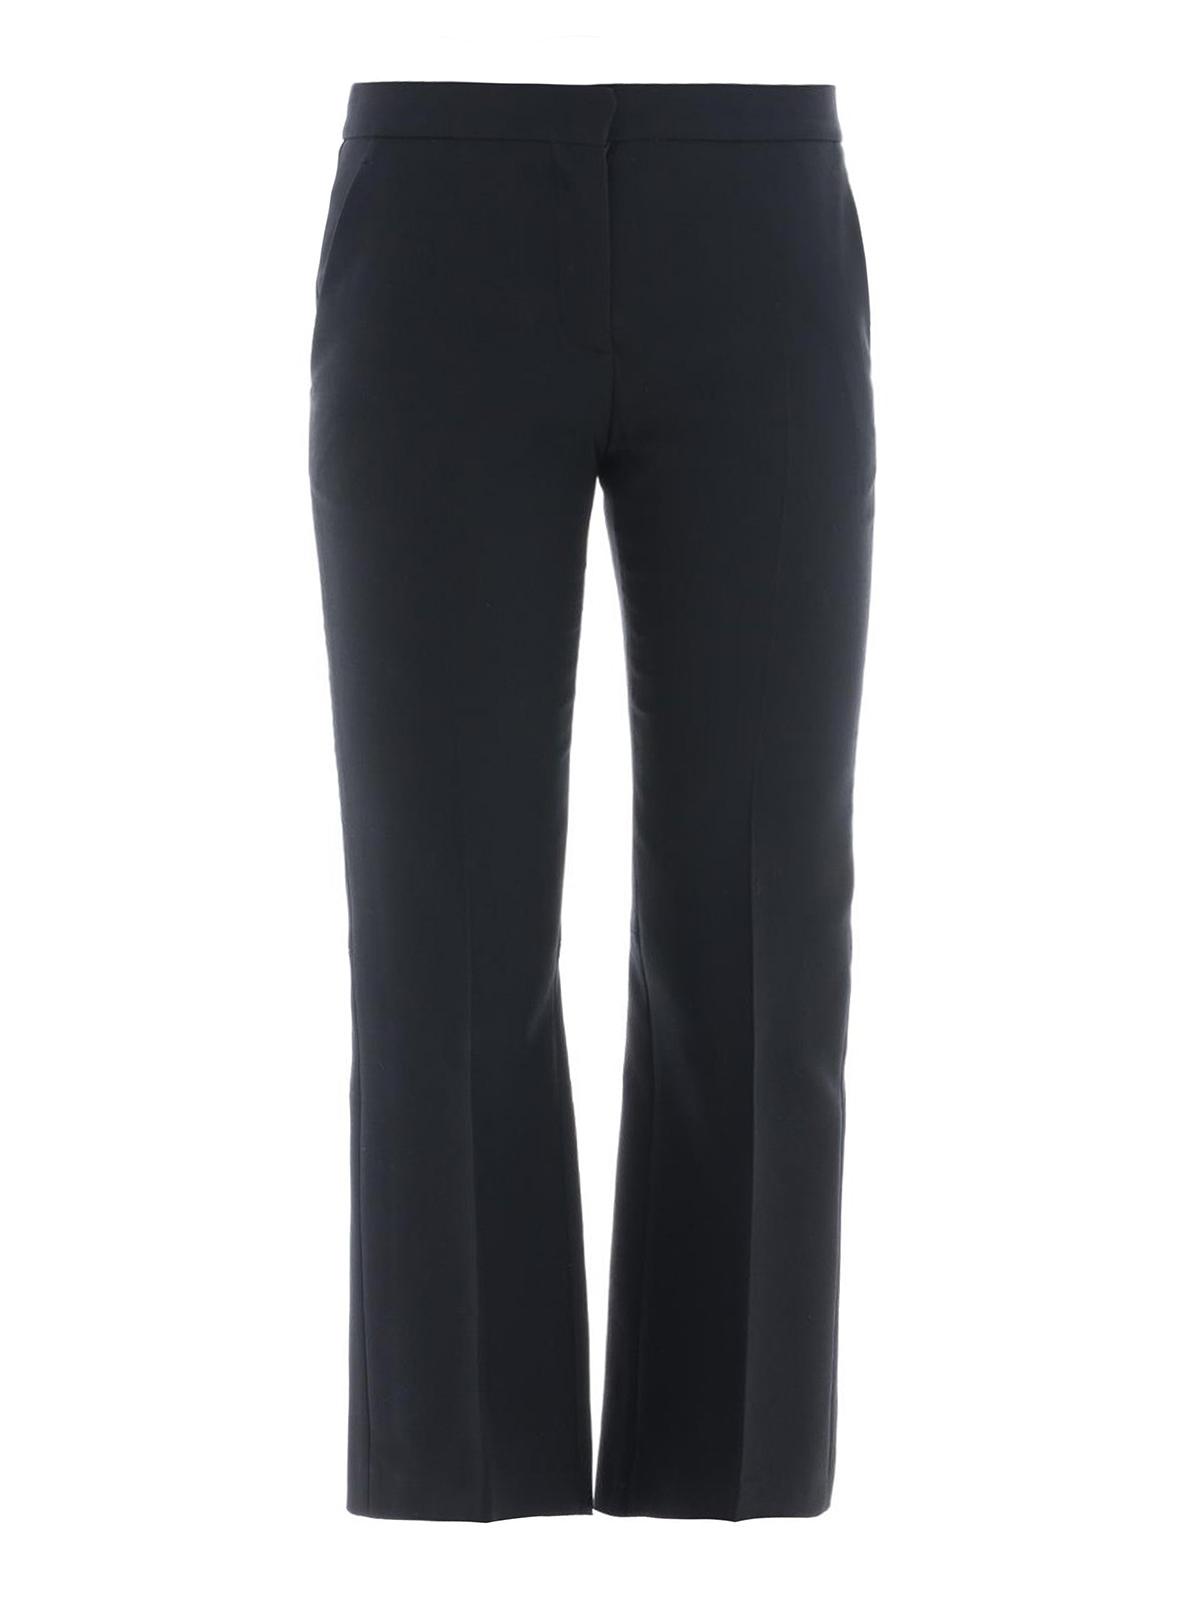 7434aa0efa2a ALEXANDER MCQUEEN  Pantalons élégants - Pantalon Couturier - Kickback